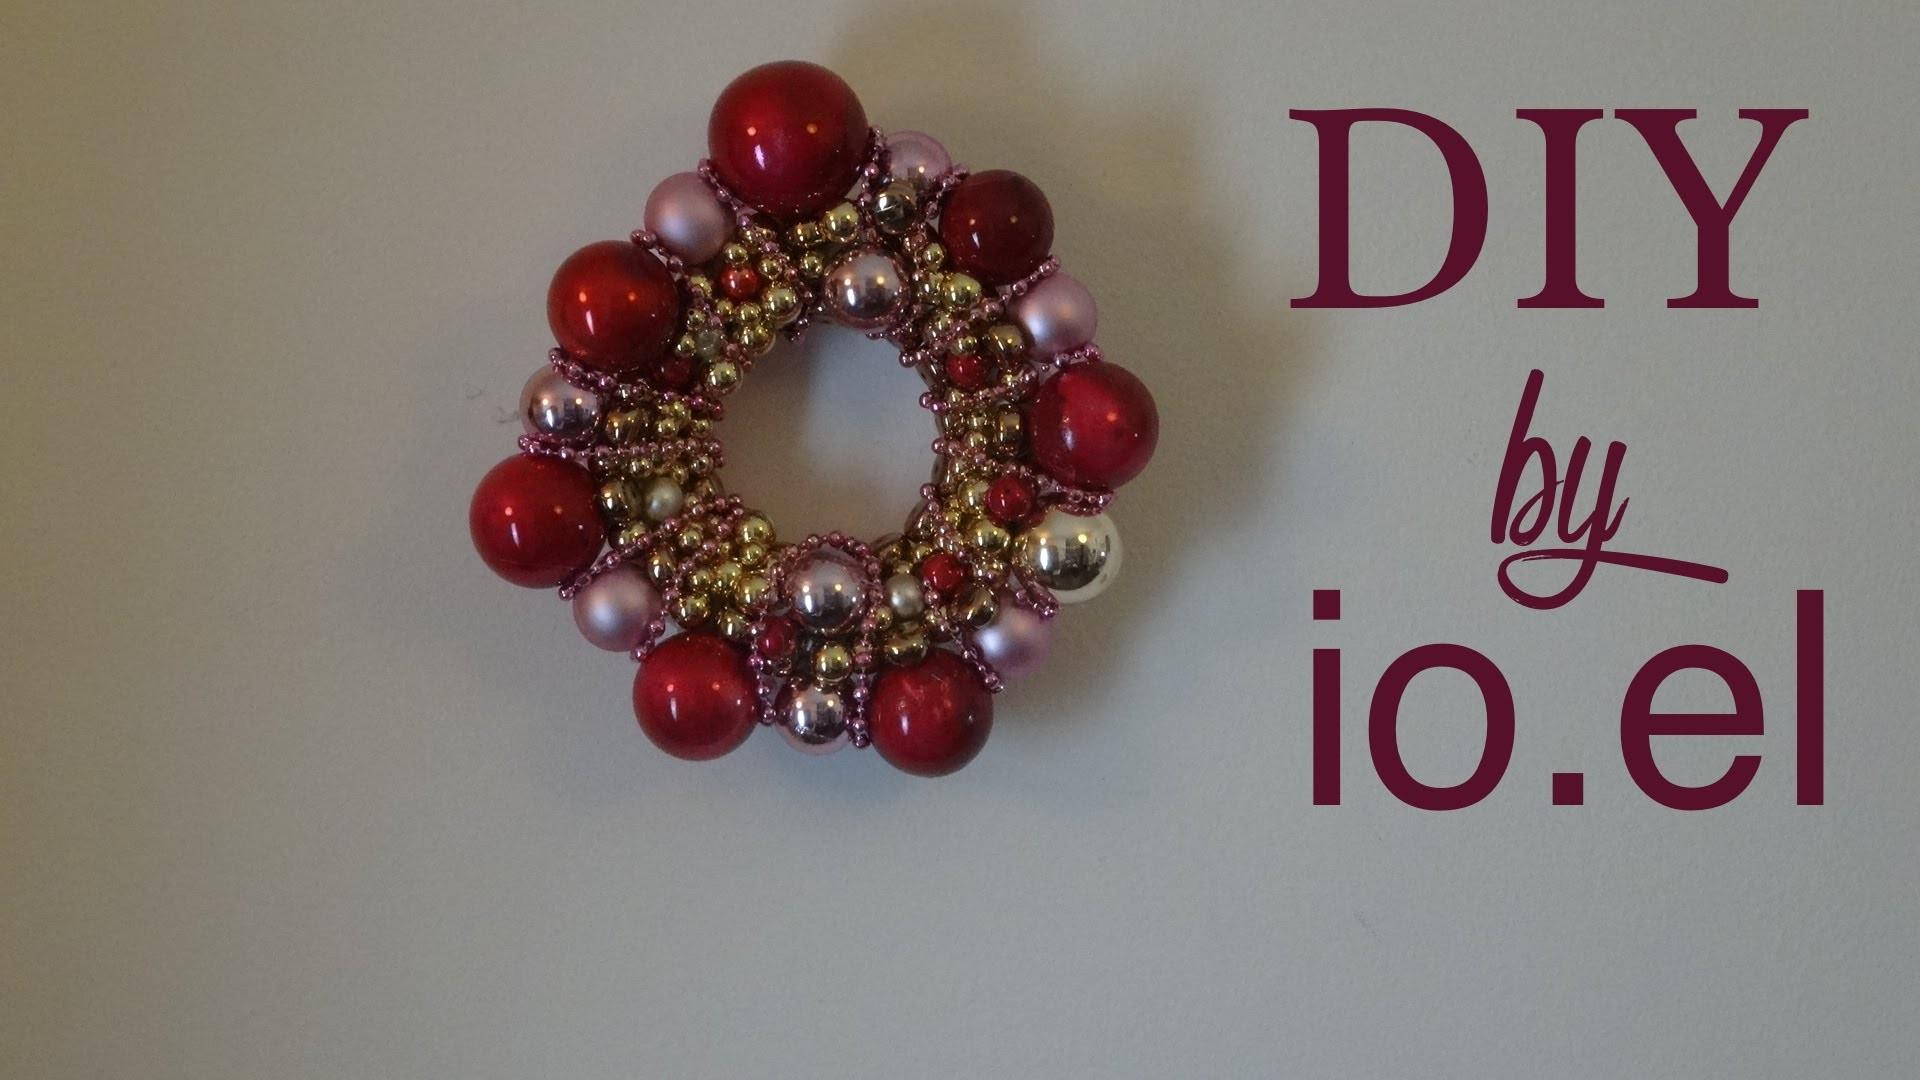 DIY. Christmas ornament - Weihnachtsdeko